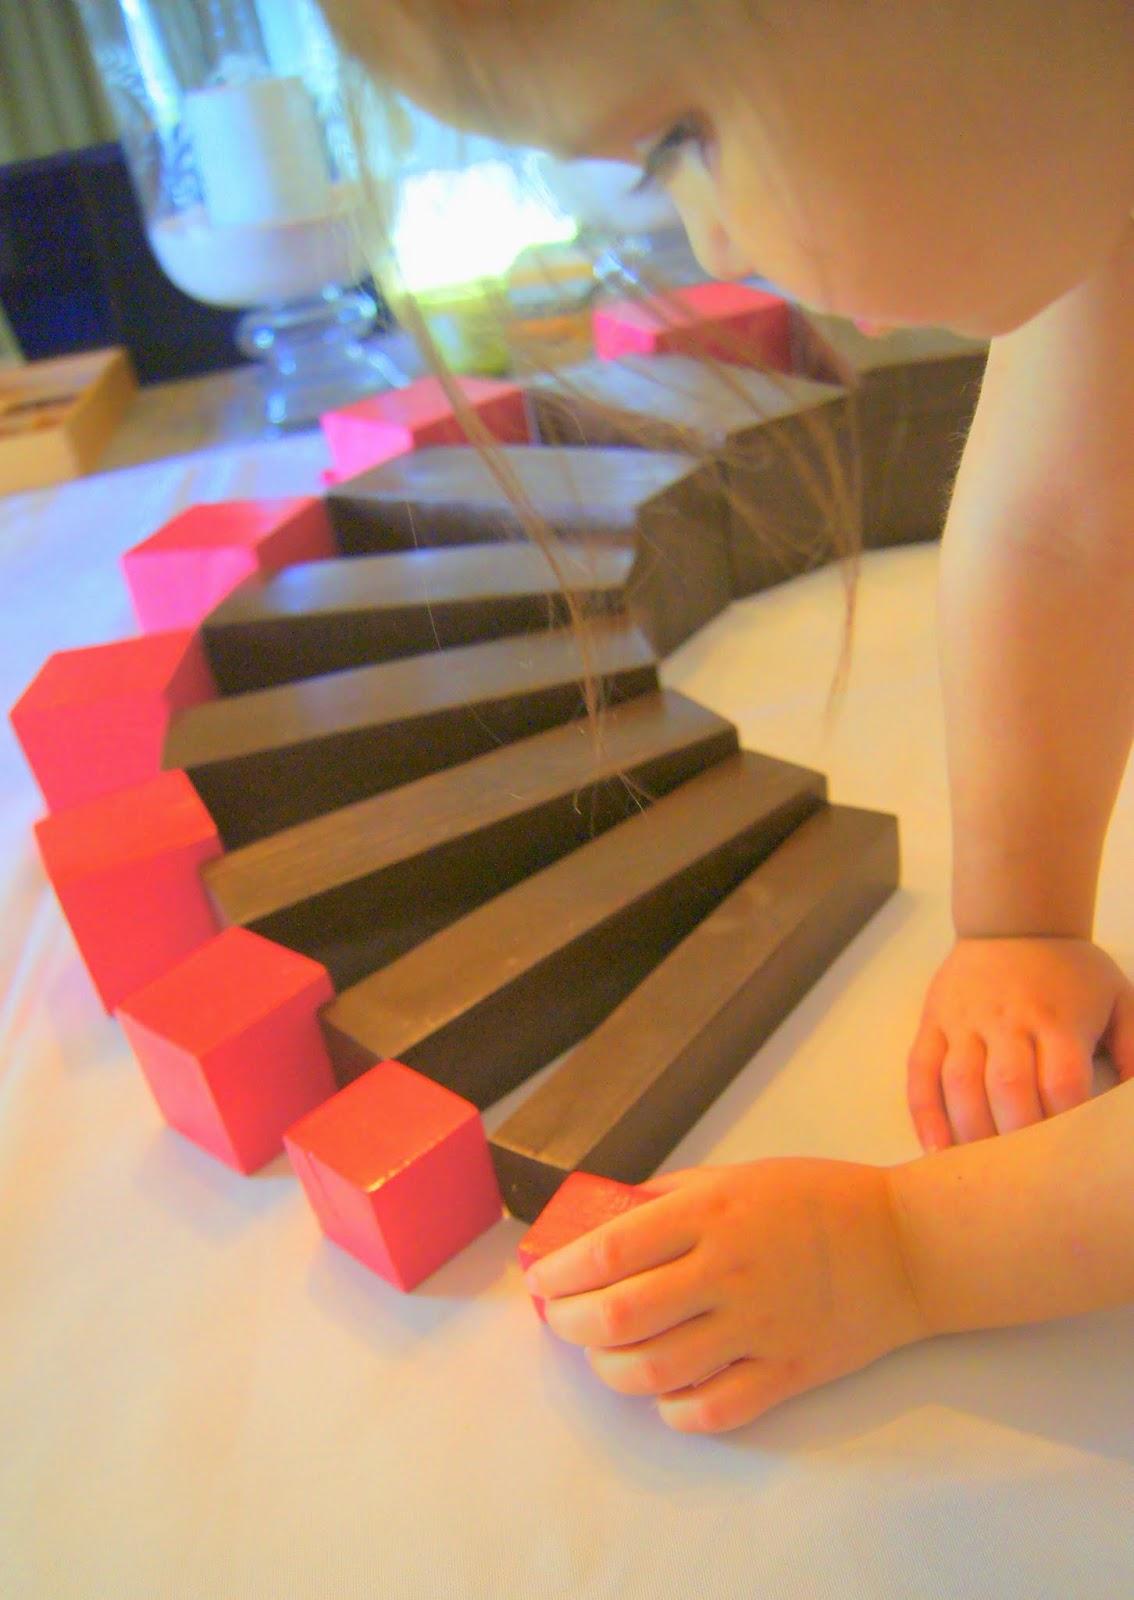 DIY Montessori Pink Tower & Brown/Broad Stair